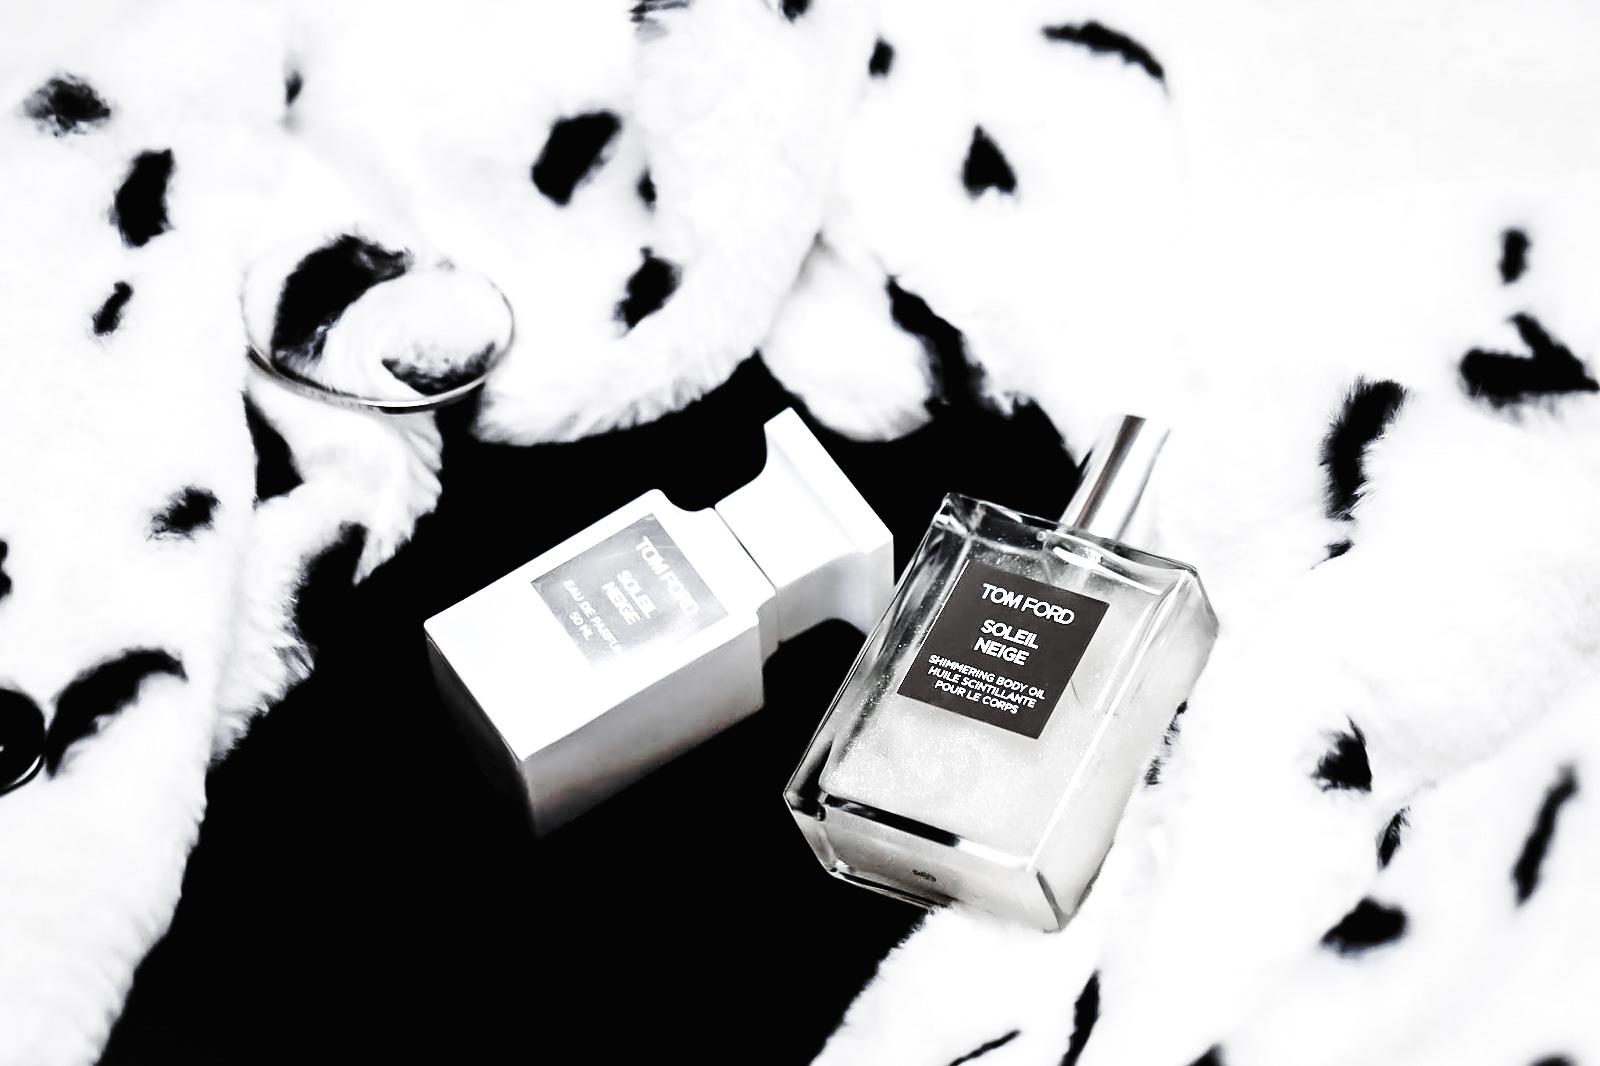 Tom Ford Soleil Neige Parfum Avis